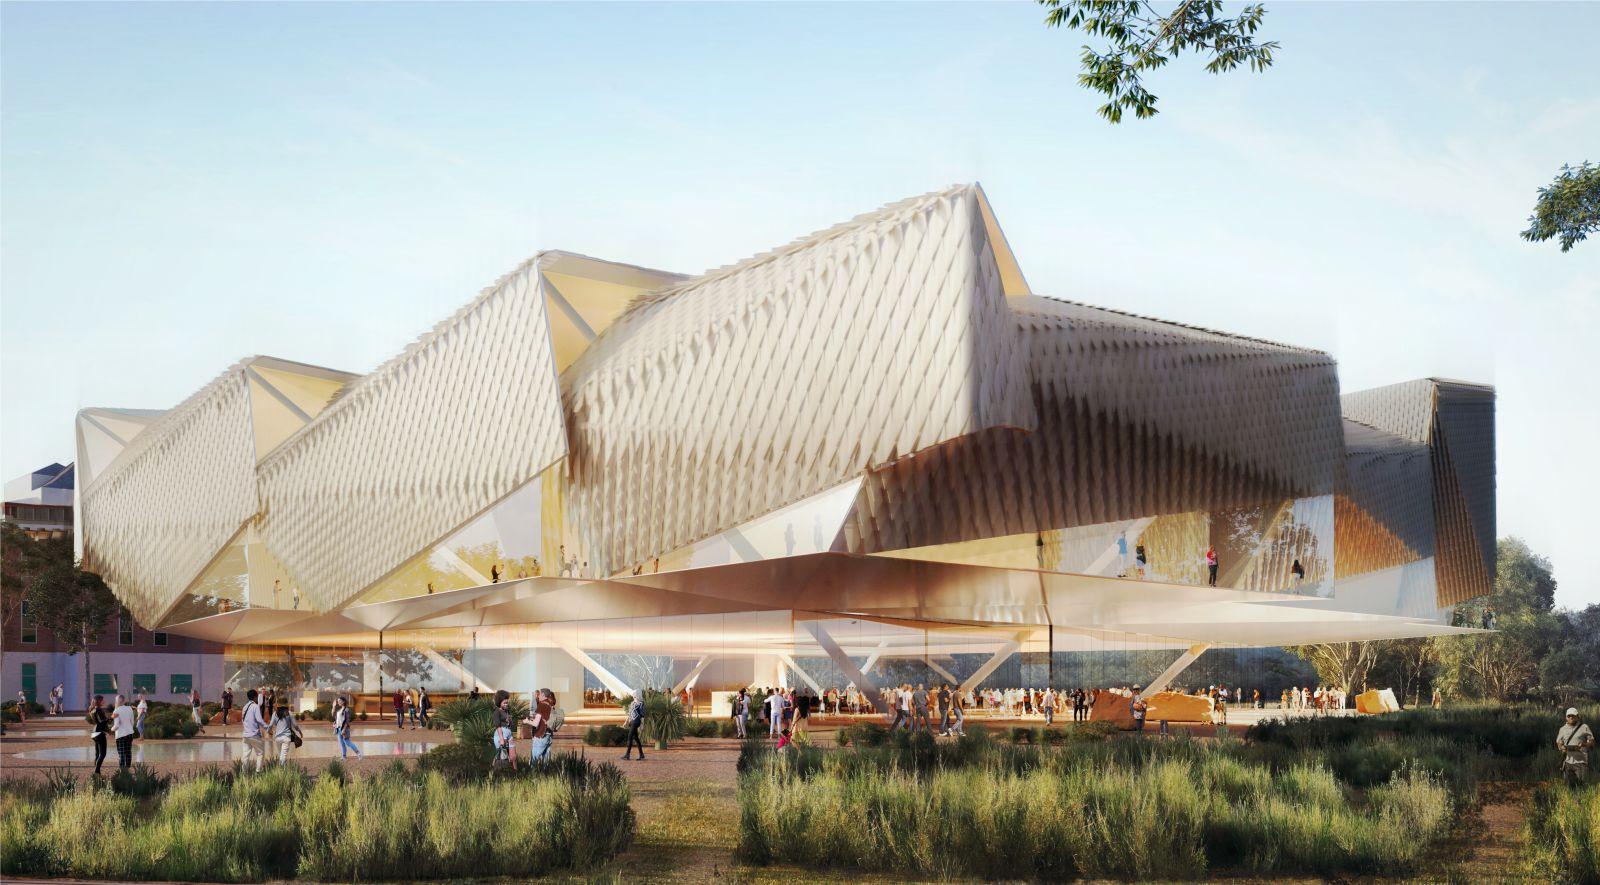 Aboriginal Art and Cultures Centre